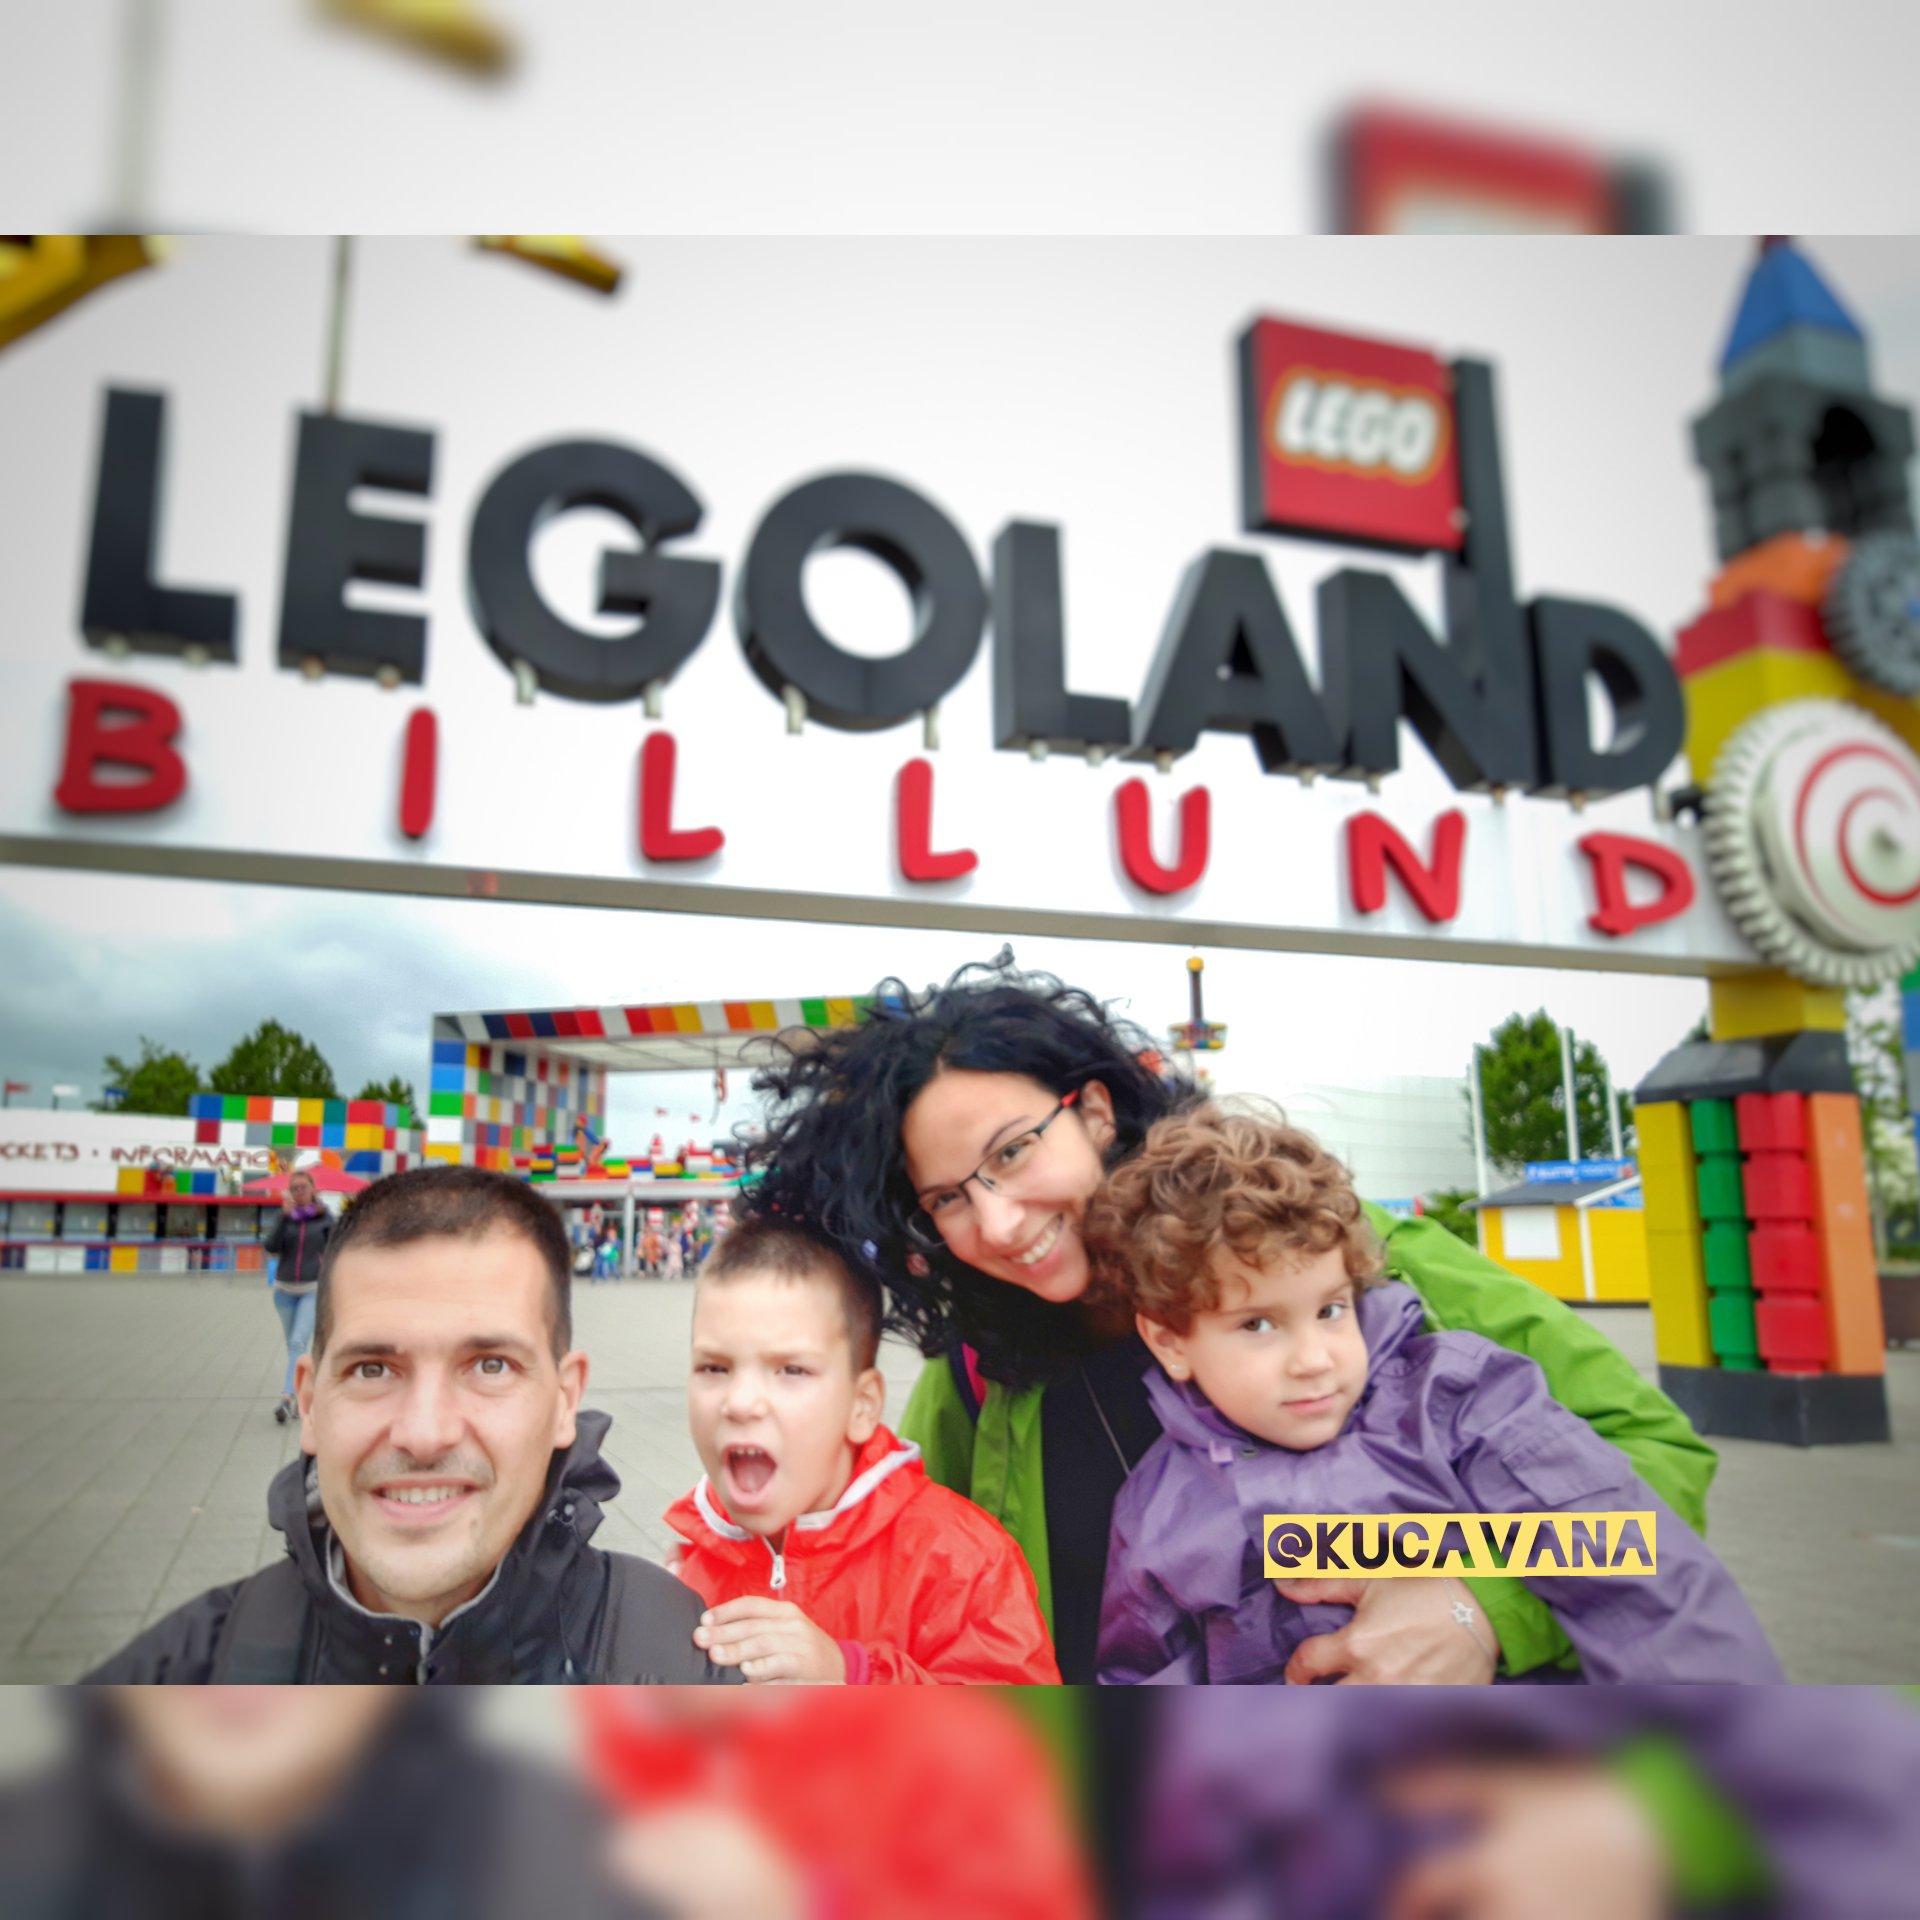 Legoland (Billund): 5 cosas a saber antes de ir